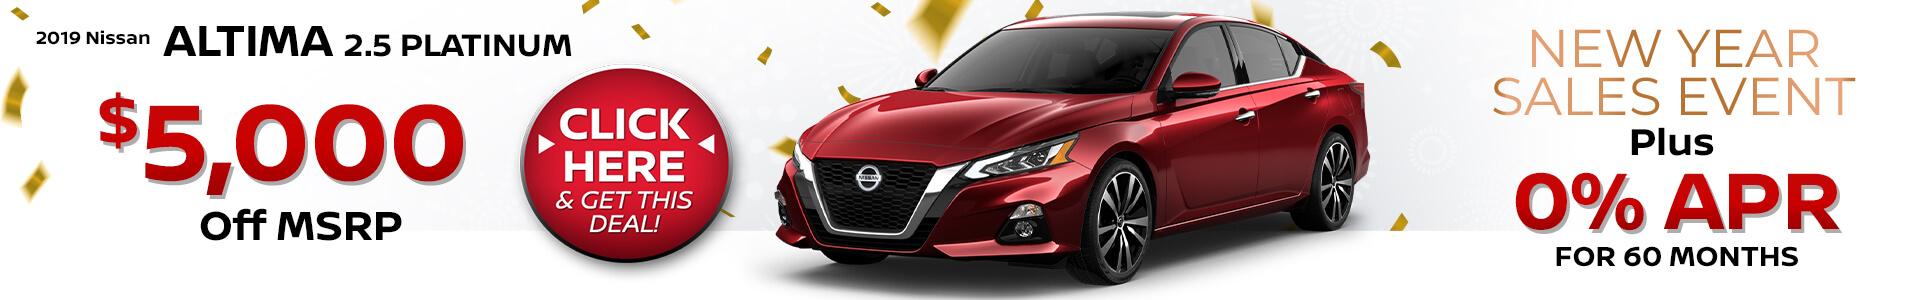 2019 Nissan Altima Purchase